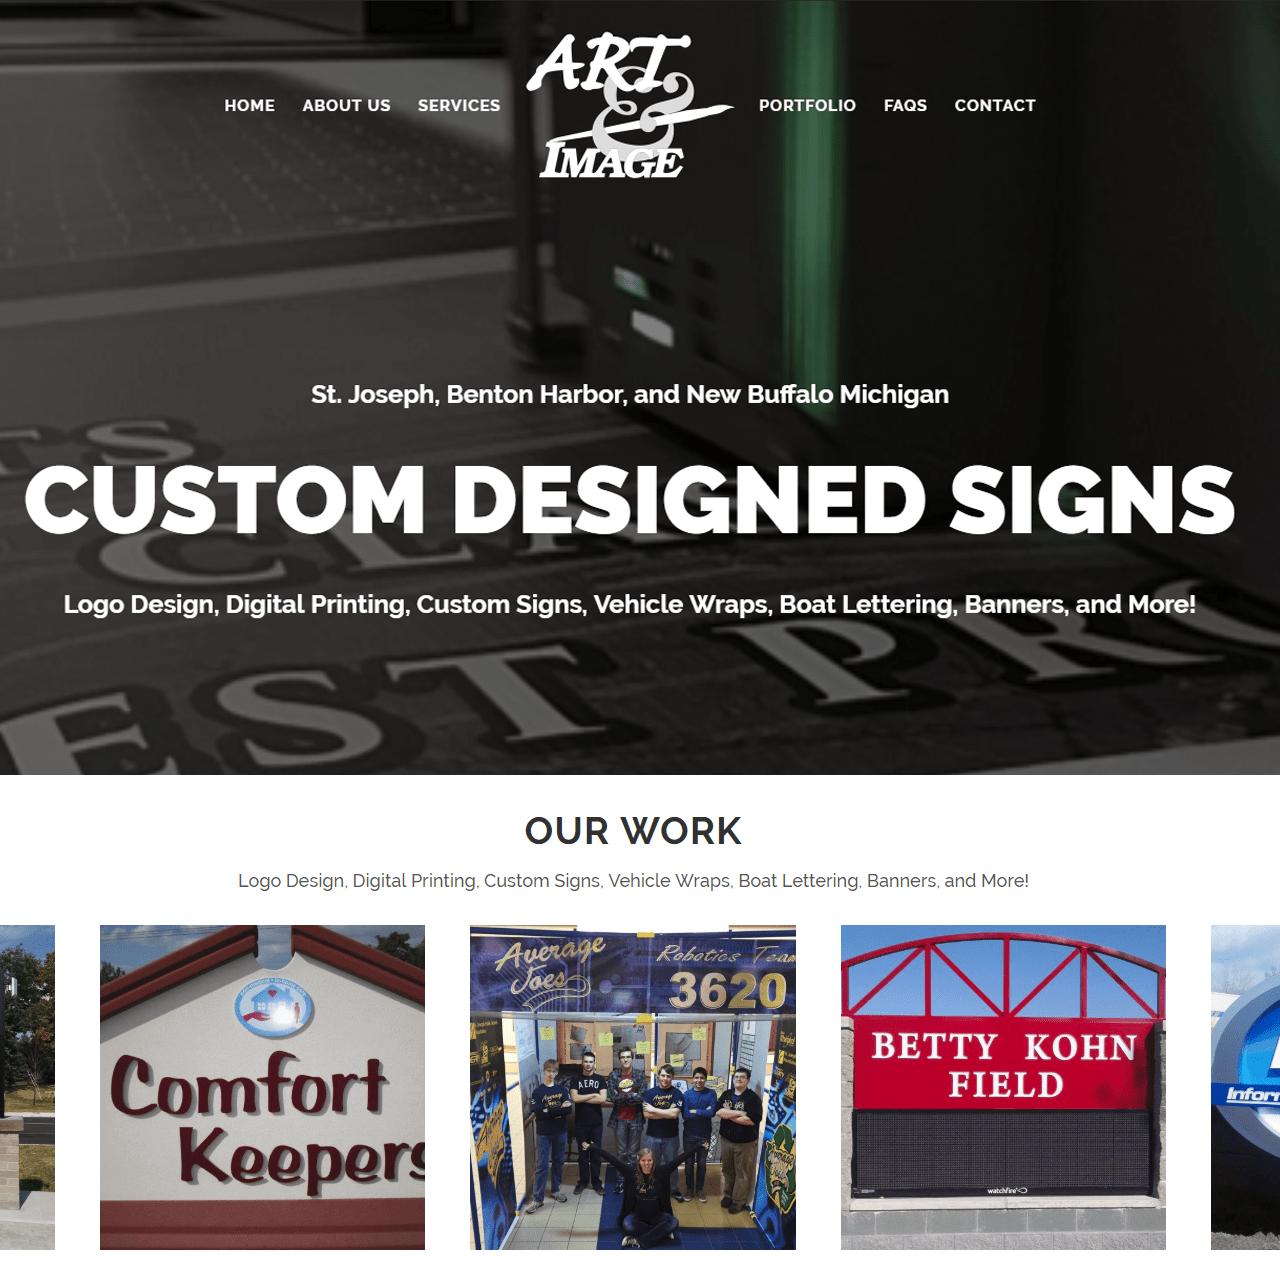 Megamad Website Design Marketing: Website Design & Development